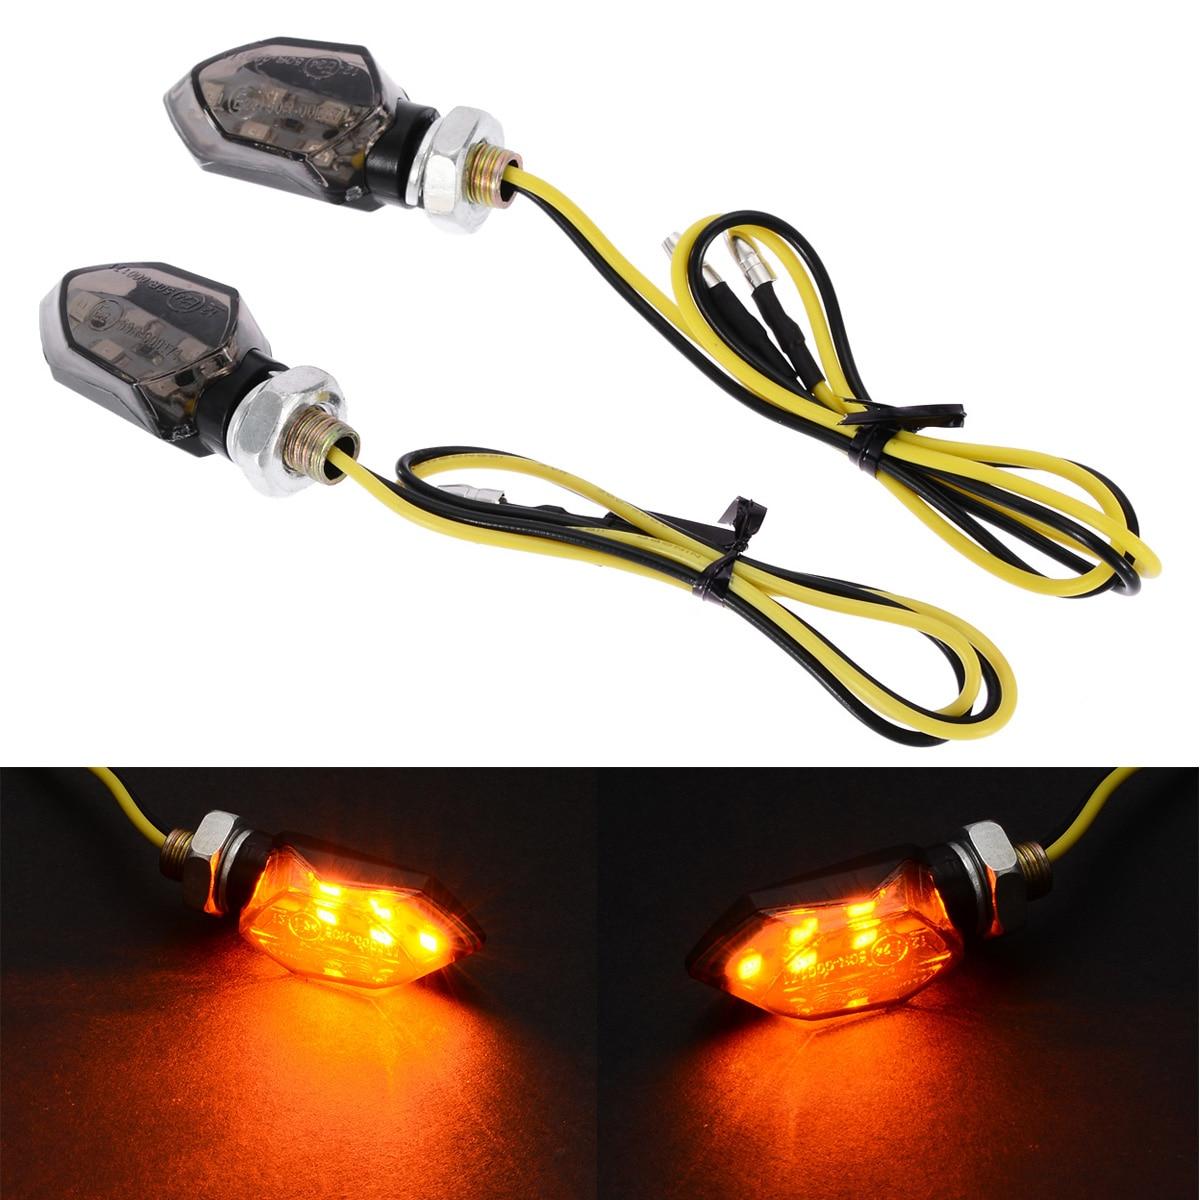 1Pair Mini Motorcycle 5LED 12V Turn Signal Indicator Light Amber Two Wire Blinker Smoke Lens Lamp For Honda Kawasaki